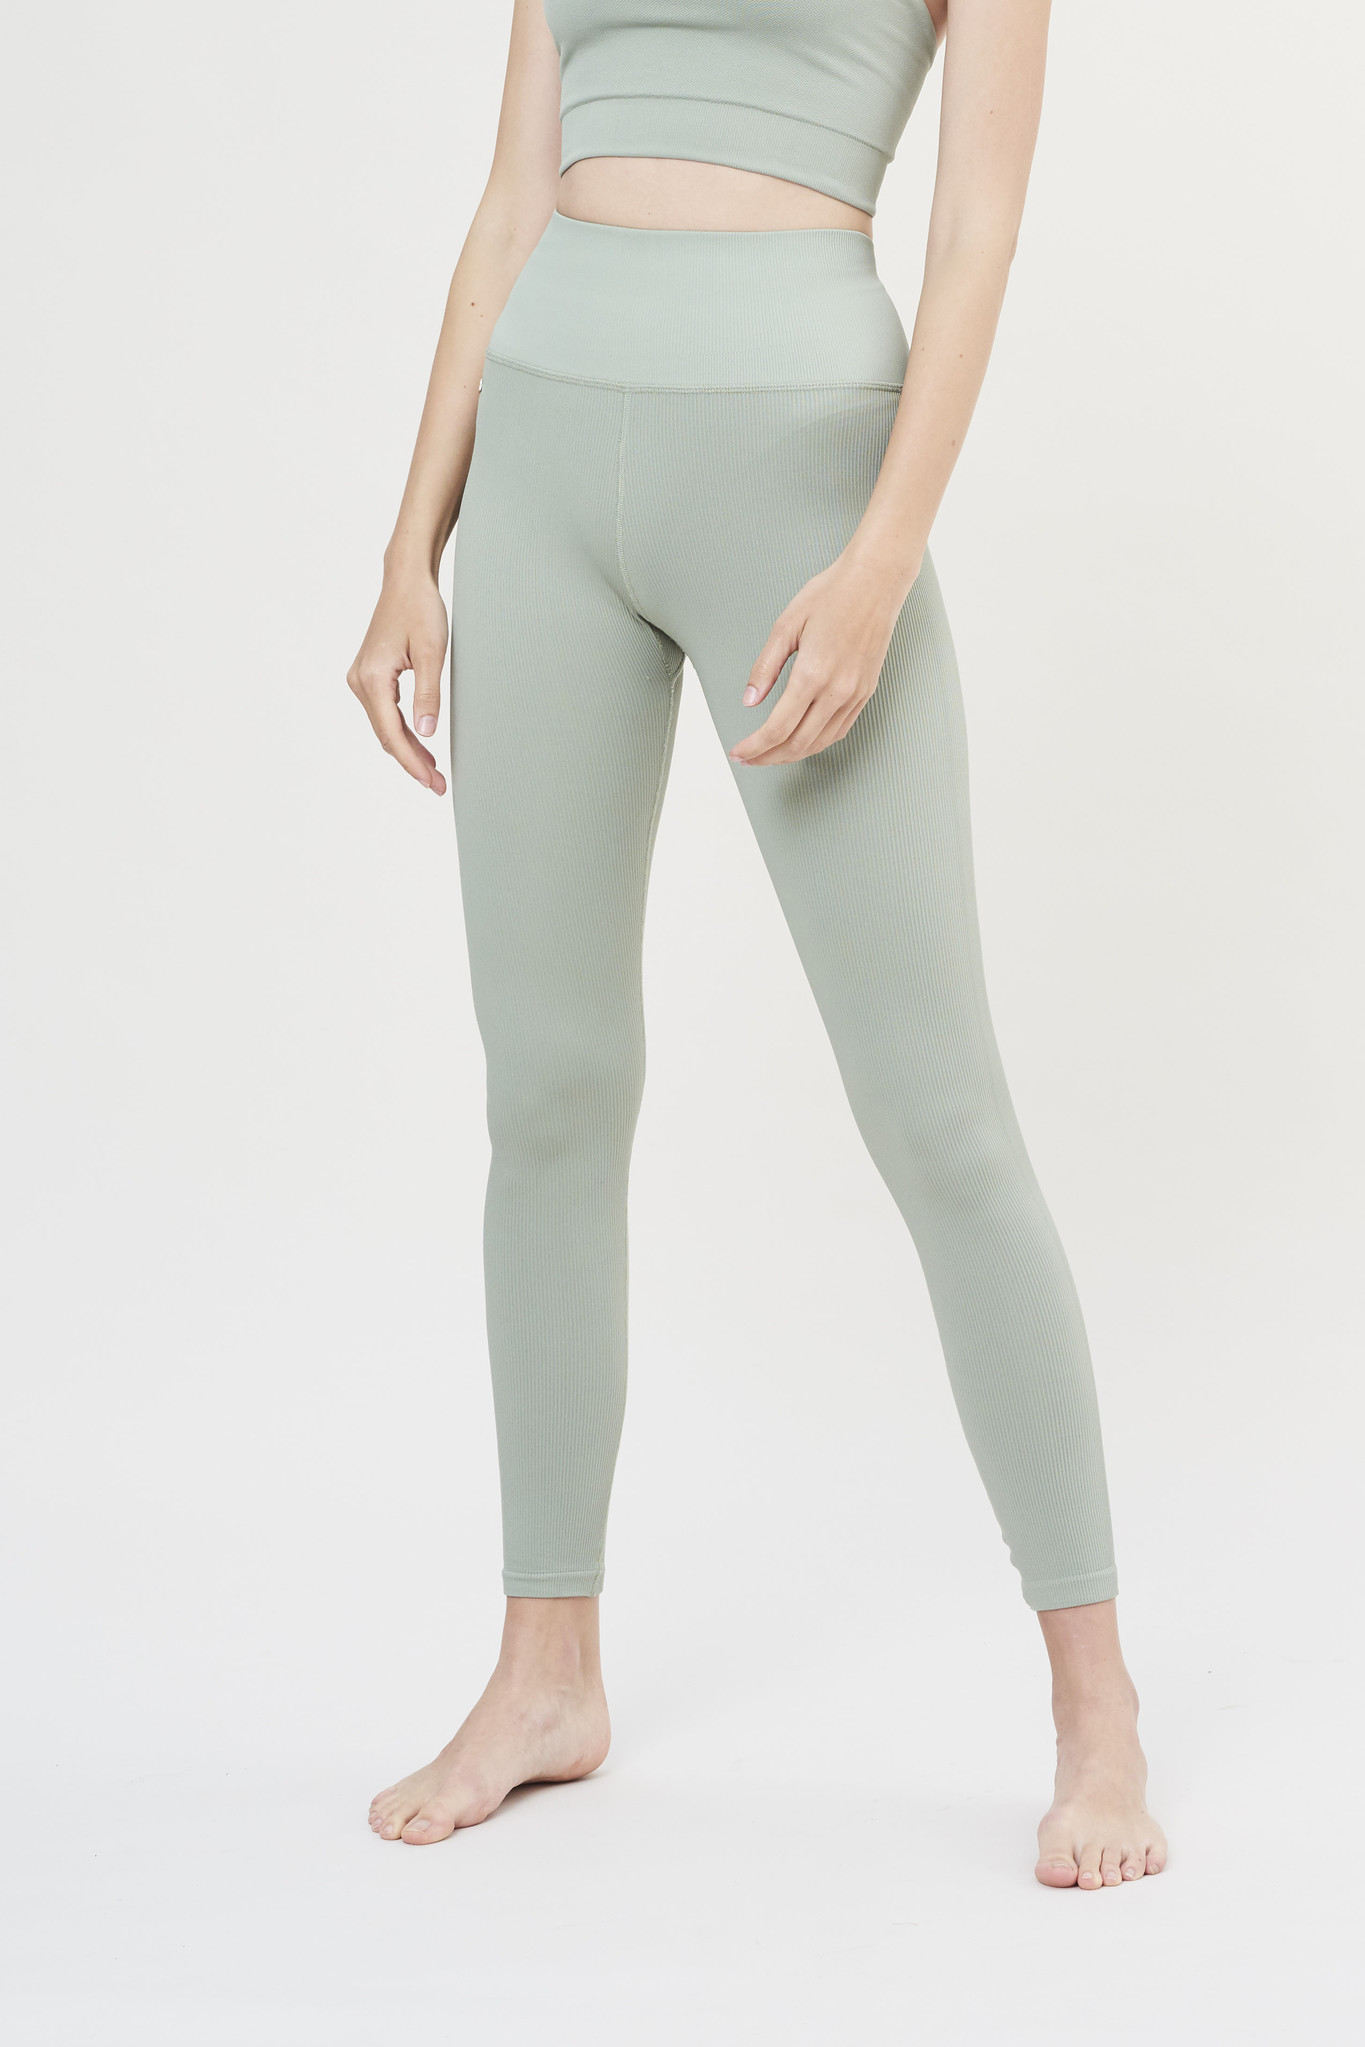 Luna Rib Legging - Sage-2